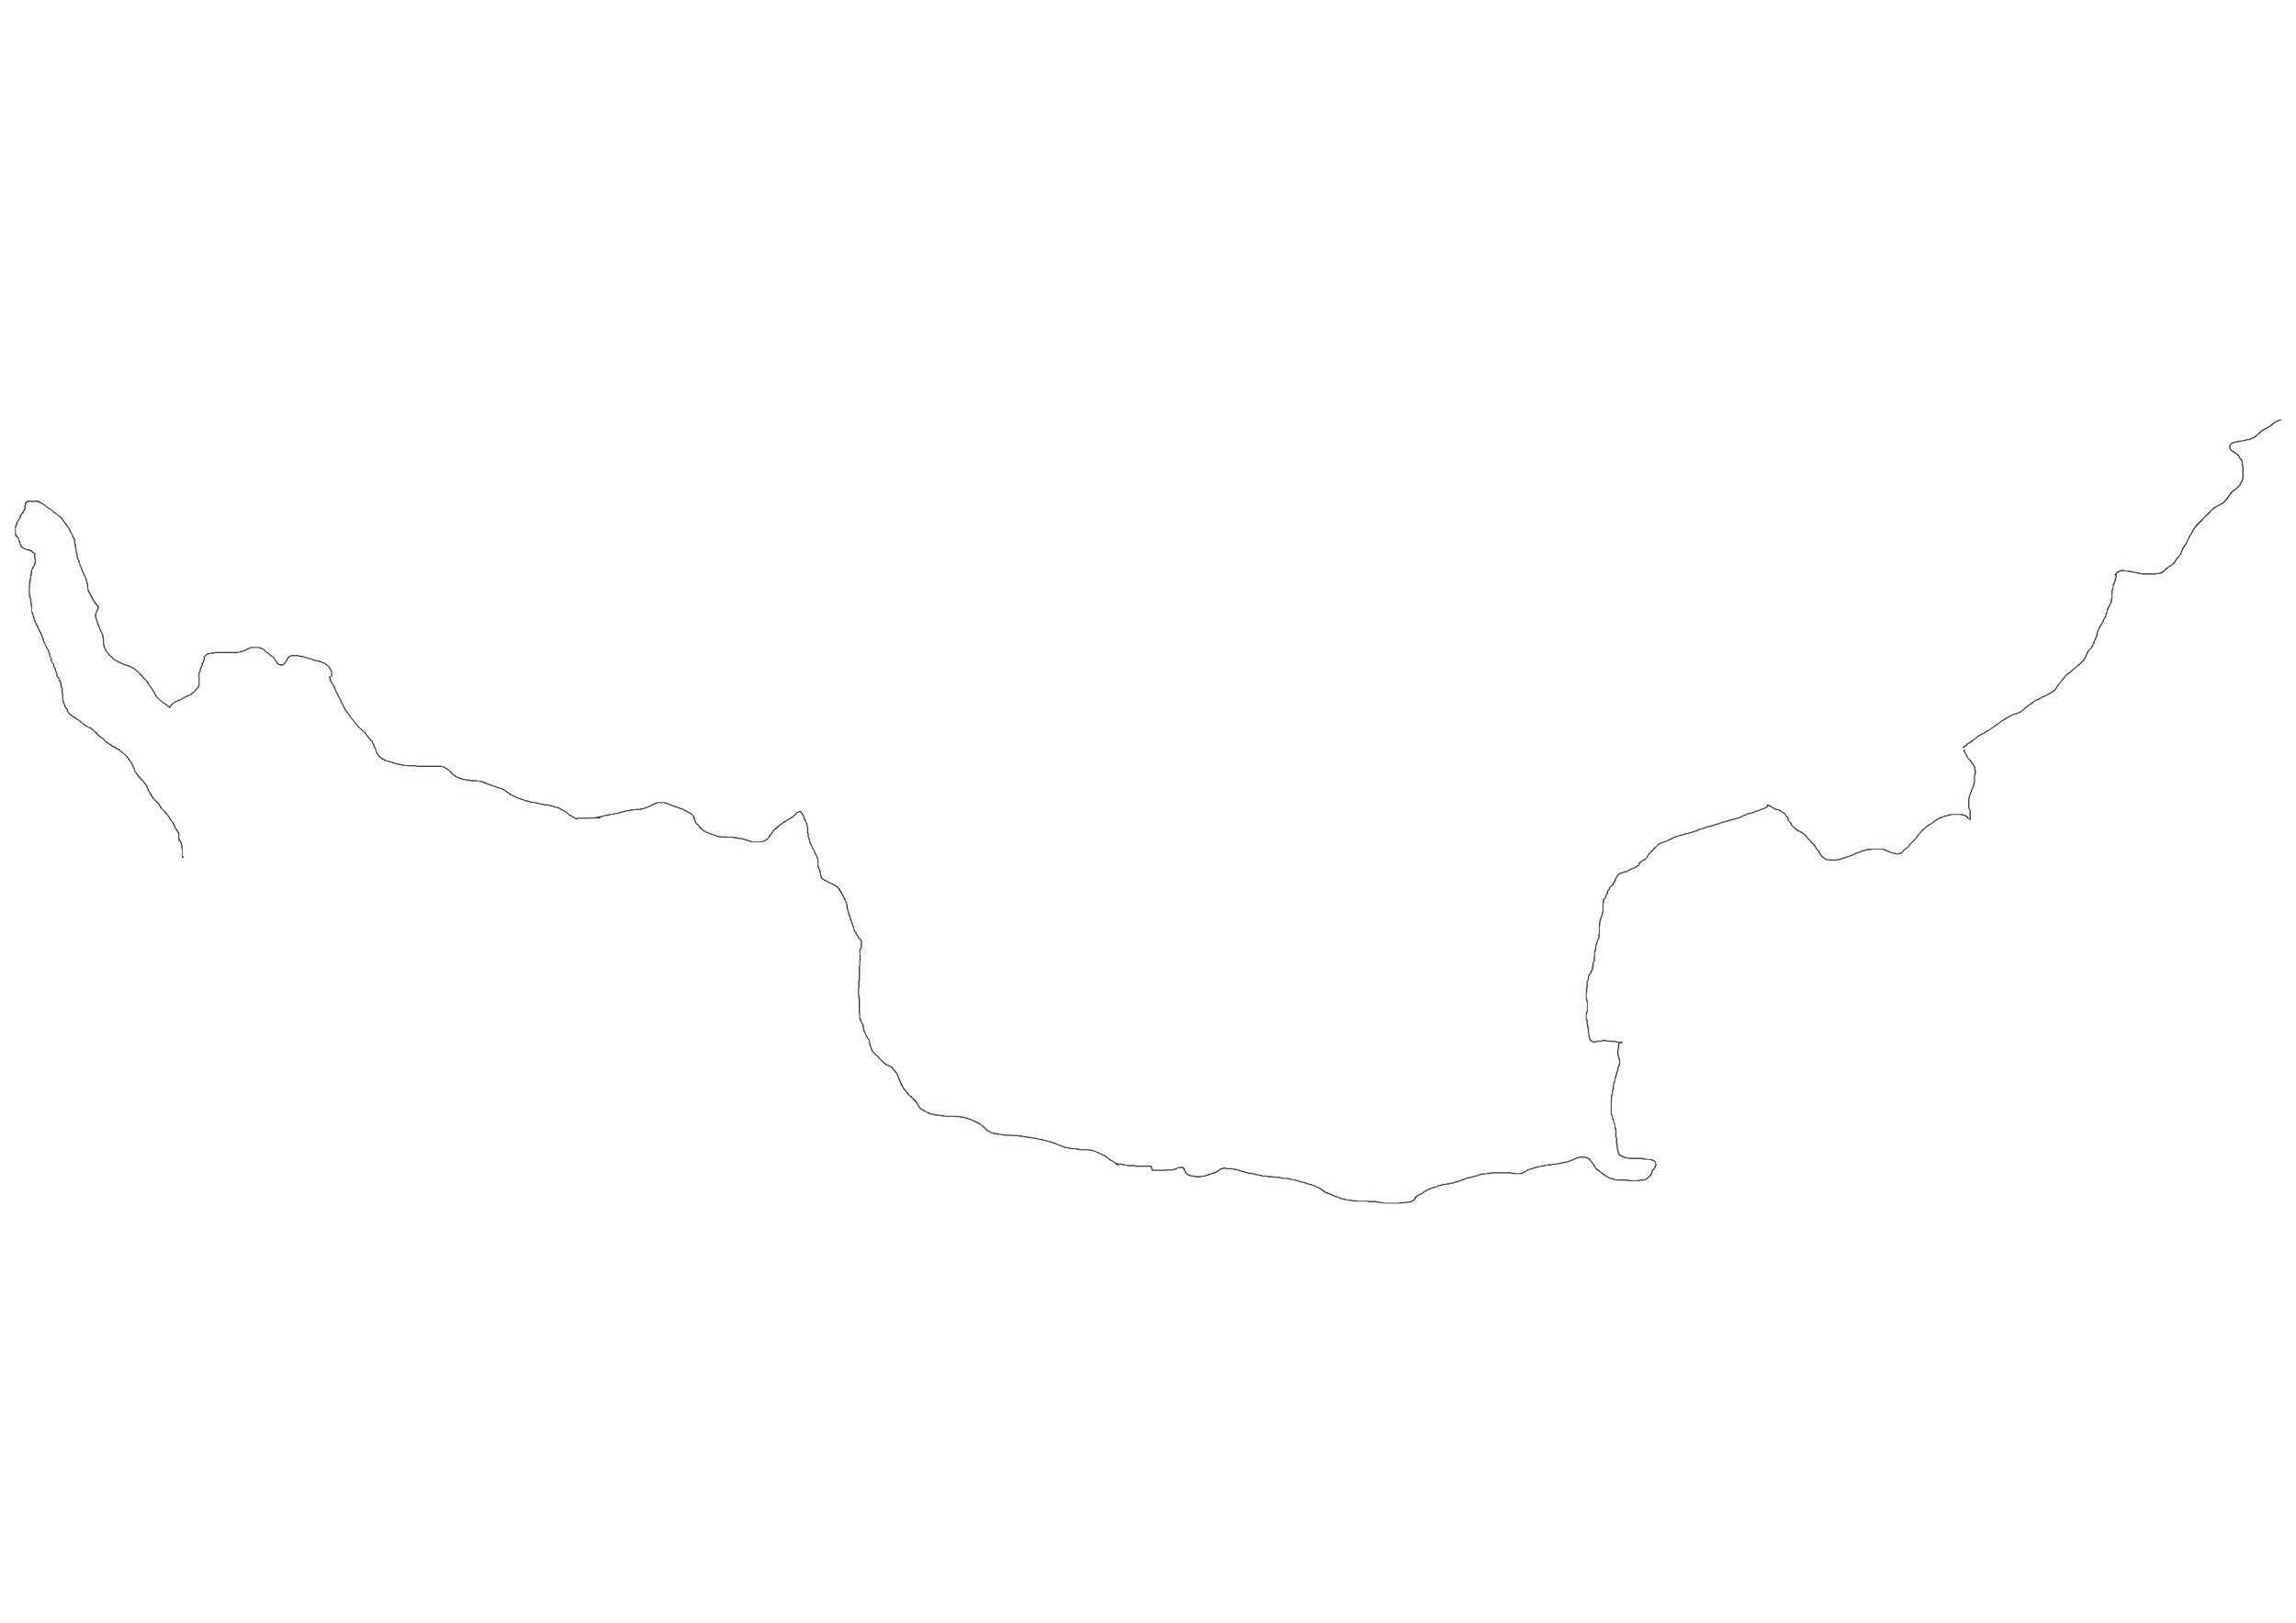 Our route, travelling from east to west. We stayed in New York, Philadelphia, Washington DC, Asheville, Nashville, Memphis, New Orleans, Austin, White City, Santa Fe, Las Vegas, Nowhere California, San Francisco, Carmel, Santa Barbara, San Diego, Los Angeles. All praise Air B'n'B 🙌